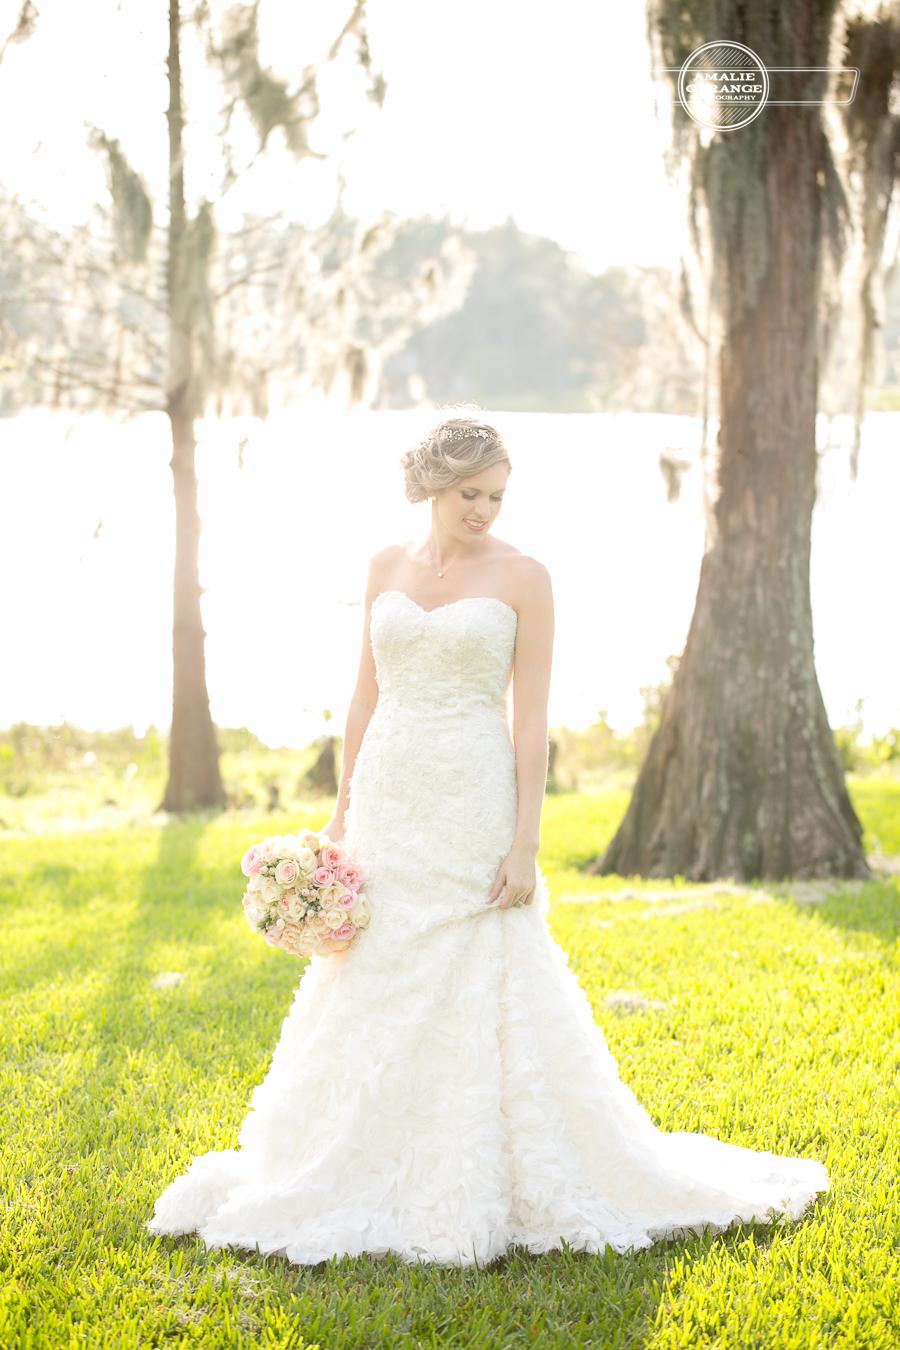 Orlando wedding photography | Cypress grove estate house